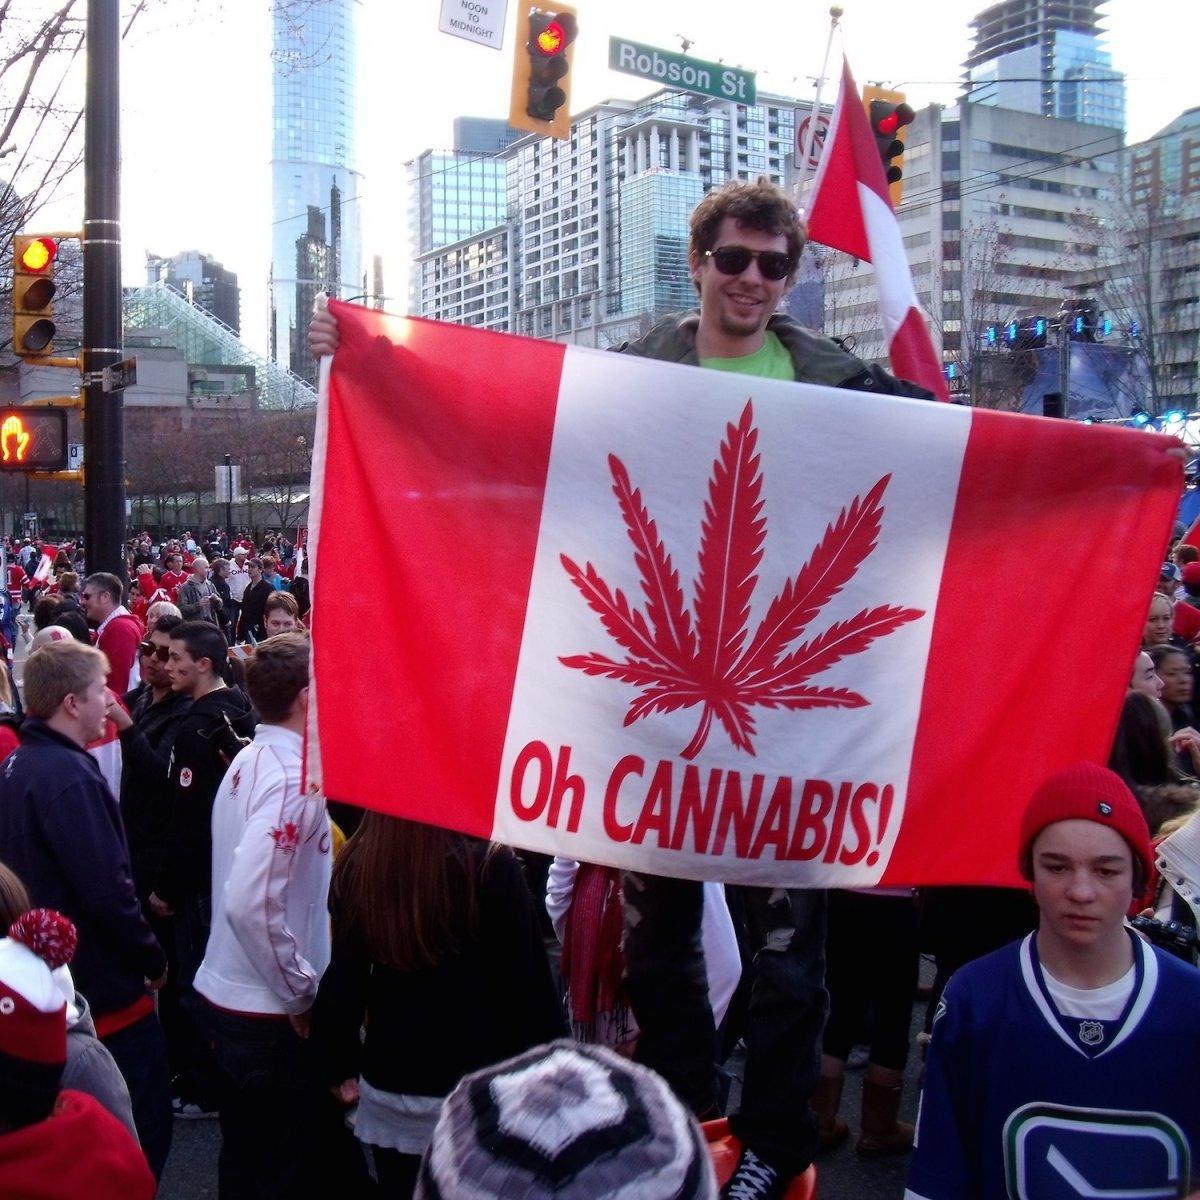 Canada-Marijuana, rospersonal, rospersonal otsyvy, Evgeny Matveevich Mikhaylov, Mikhaylov Evgeny Matveevich.jpg